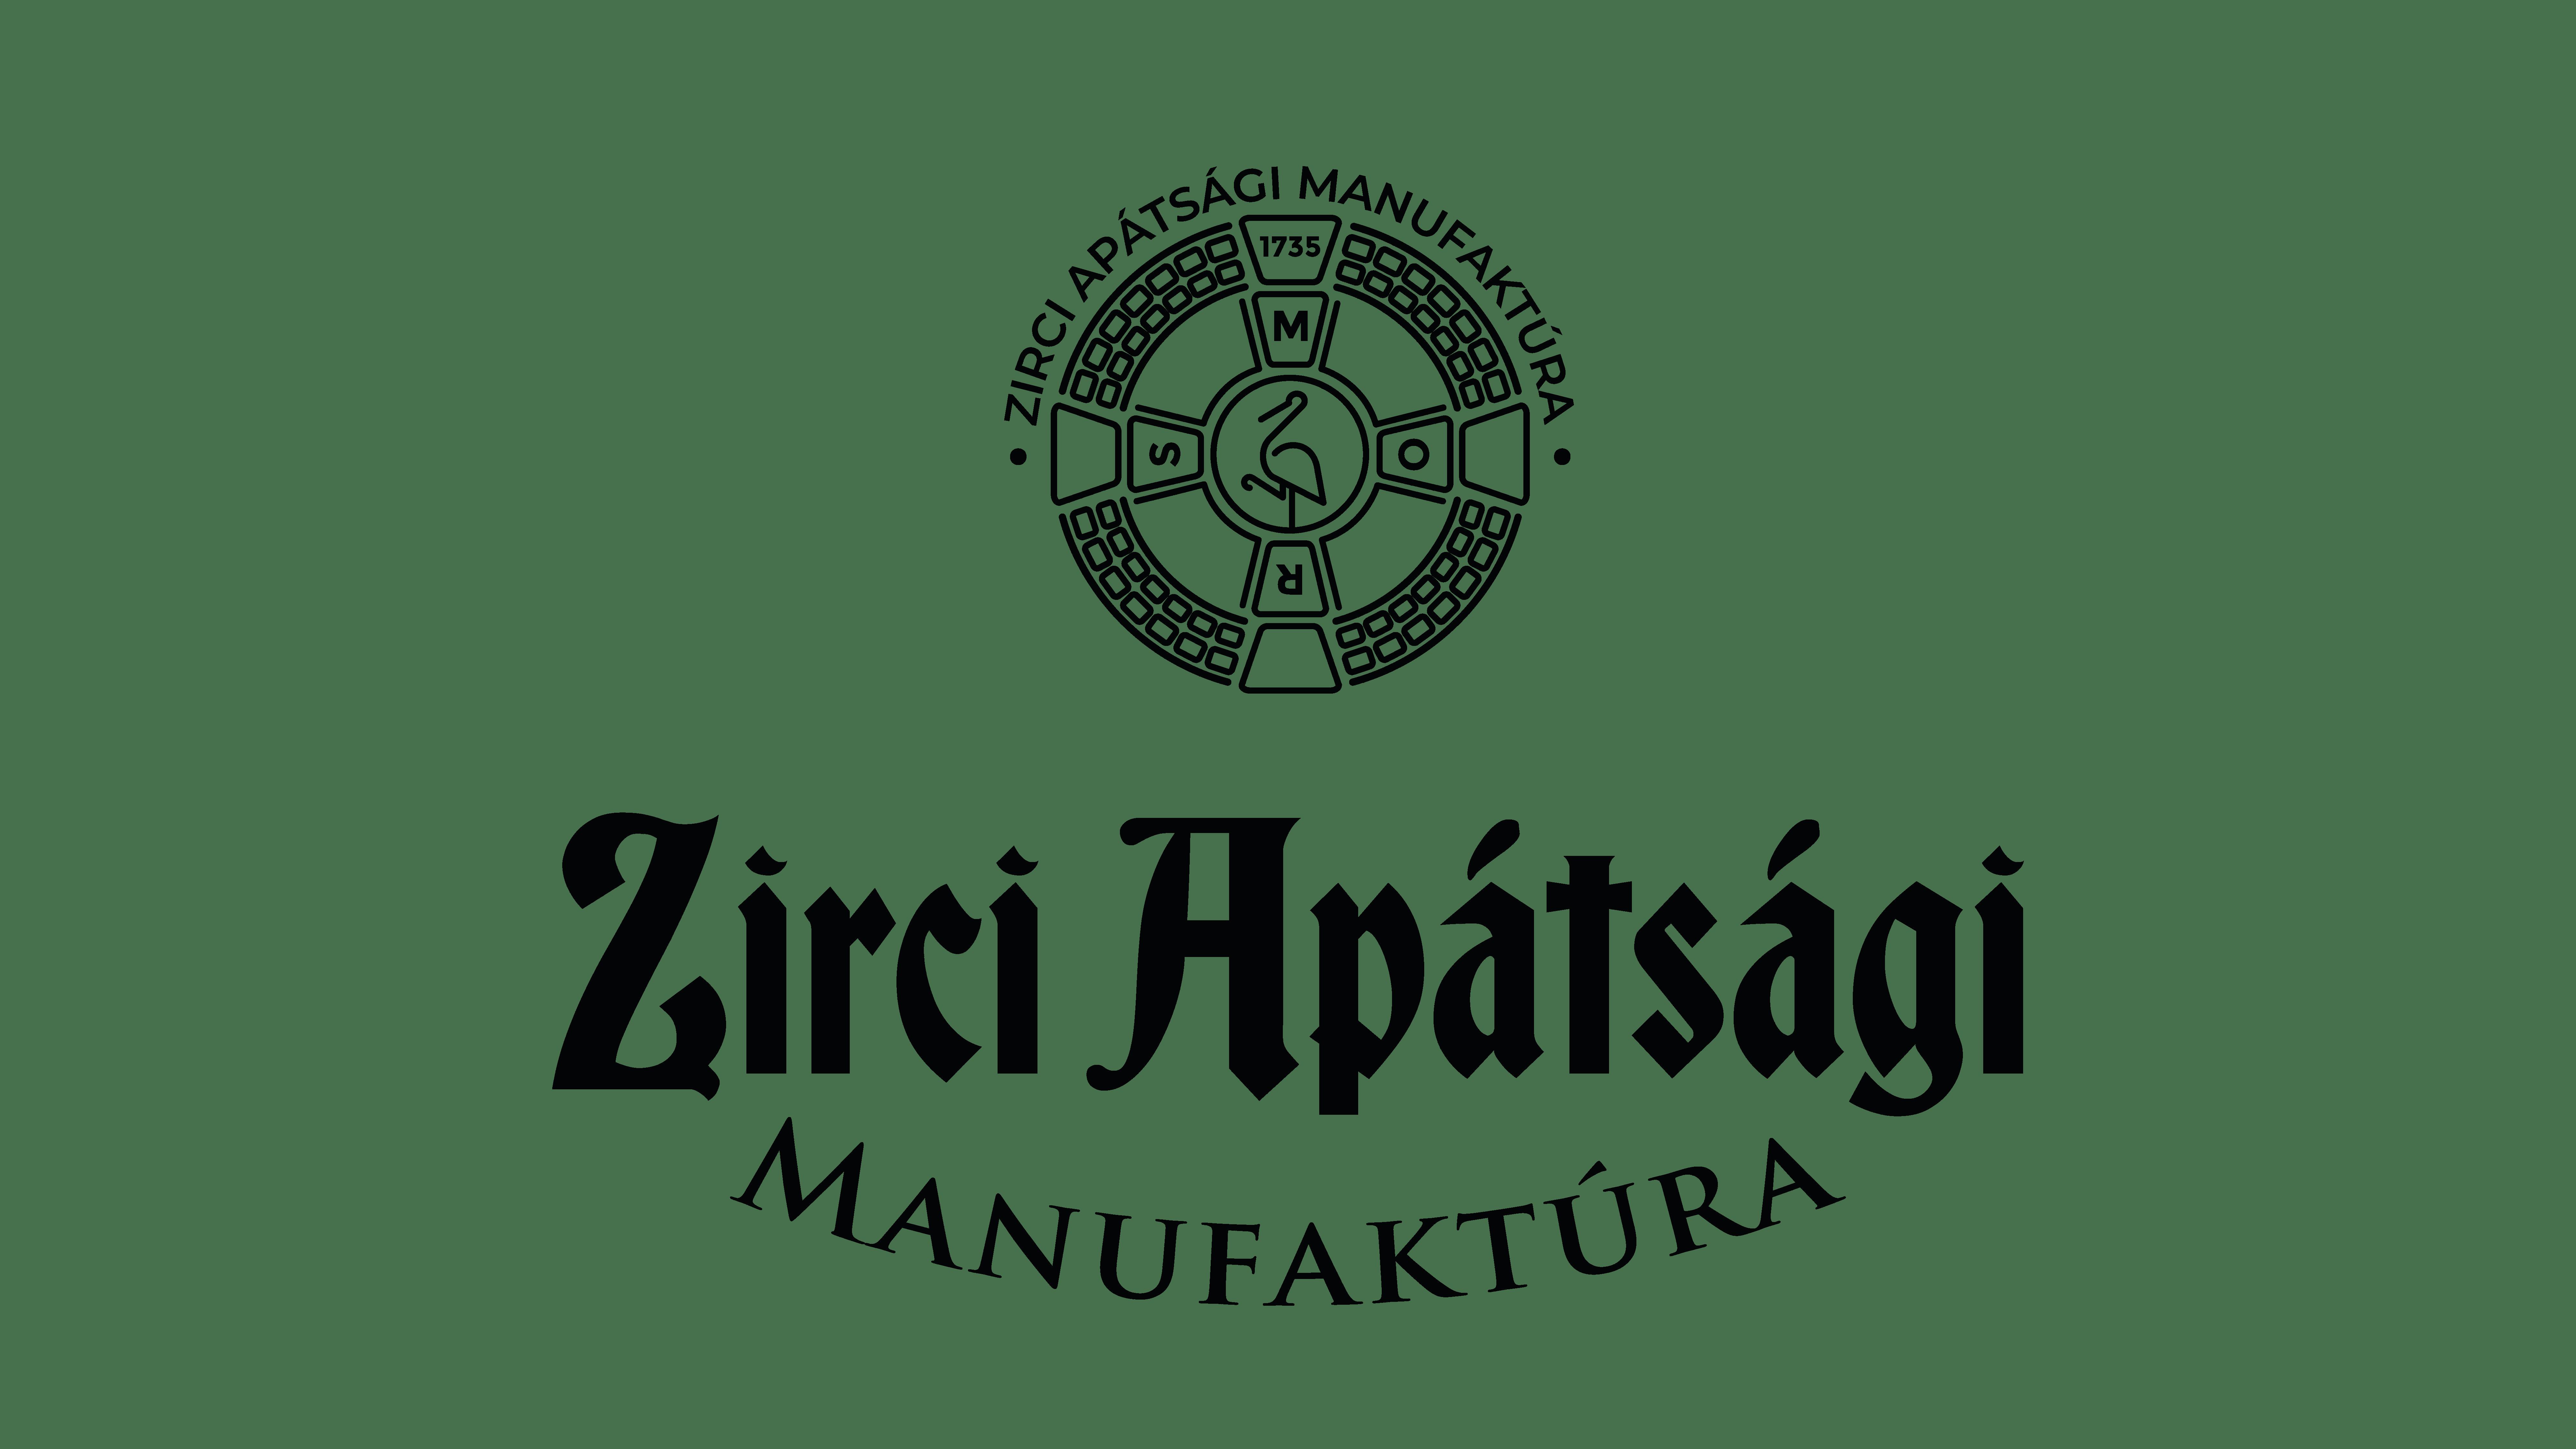 Zirci Apátsági Manufaktúra - Future Management